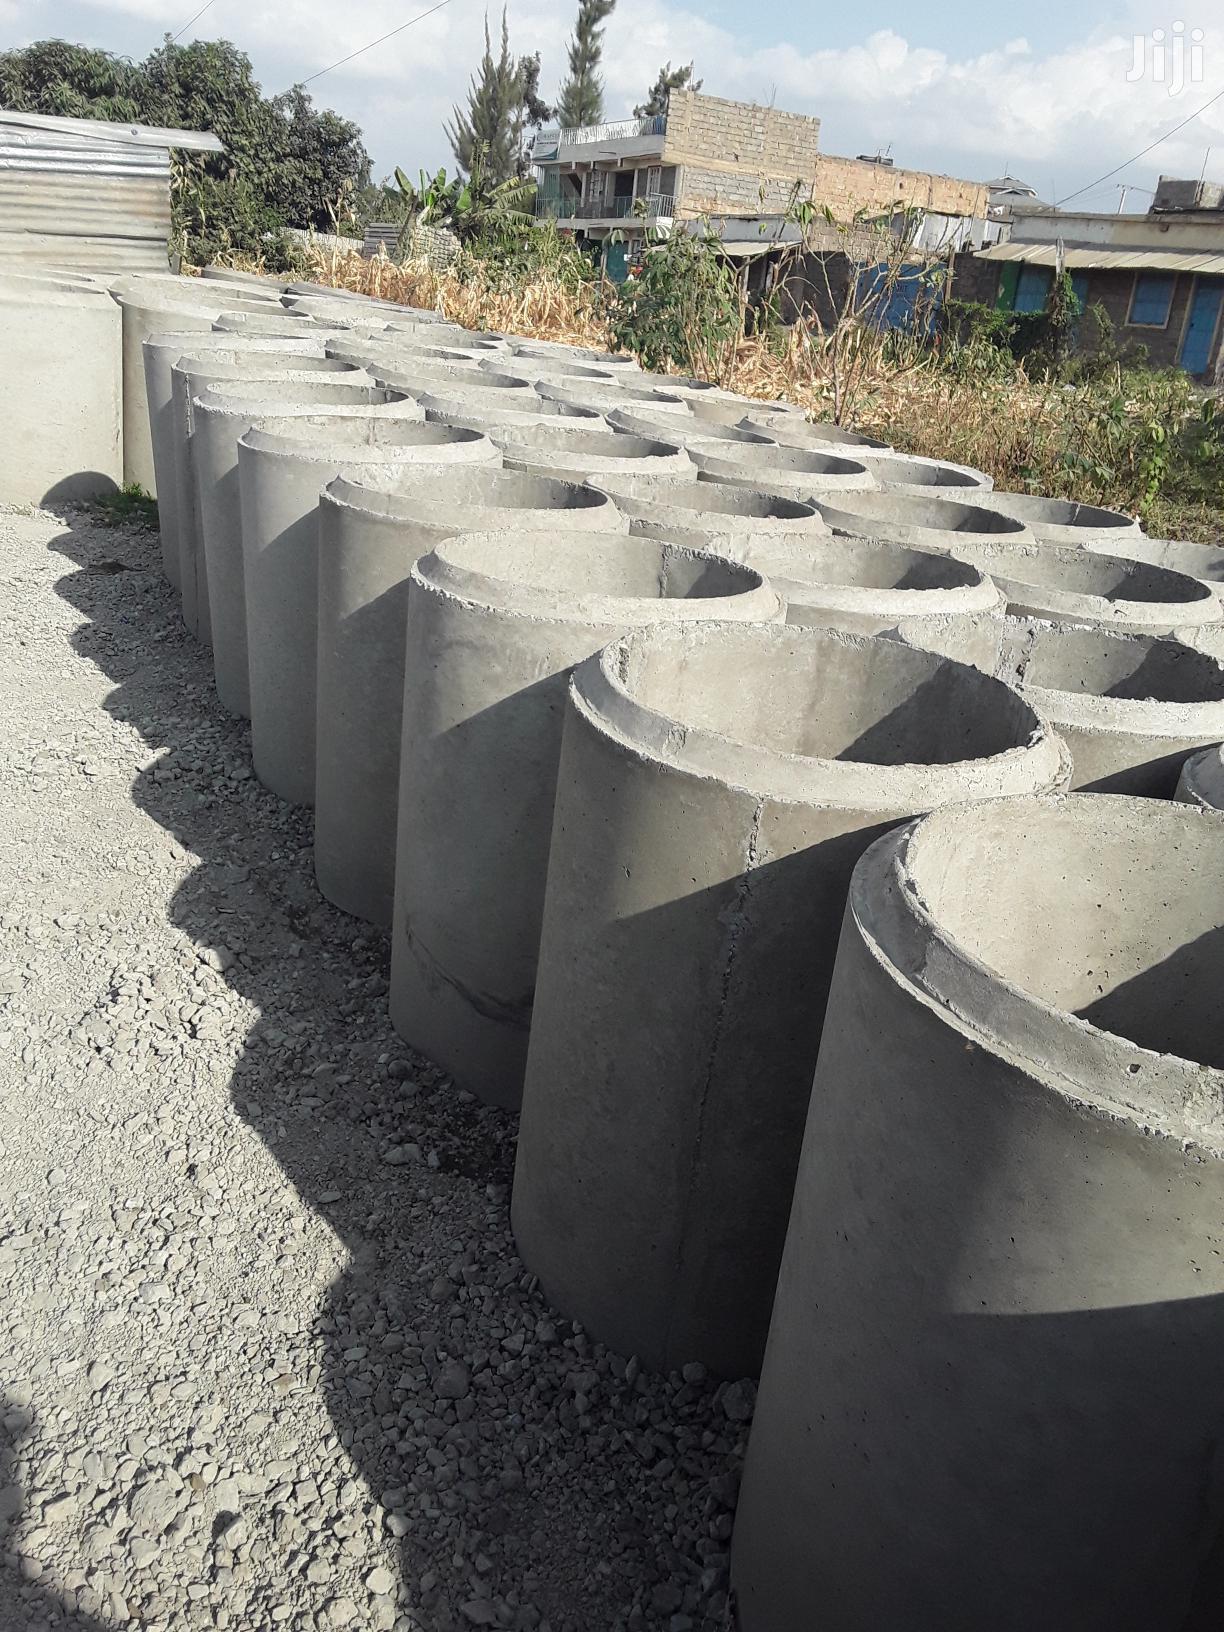 Modtec Construction Materials | Building Materials for sale in Utalii, Nairobi, Kenya